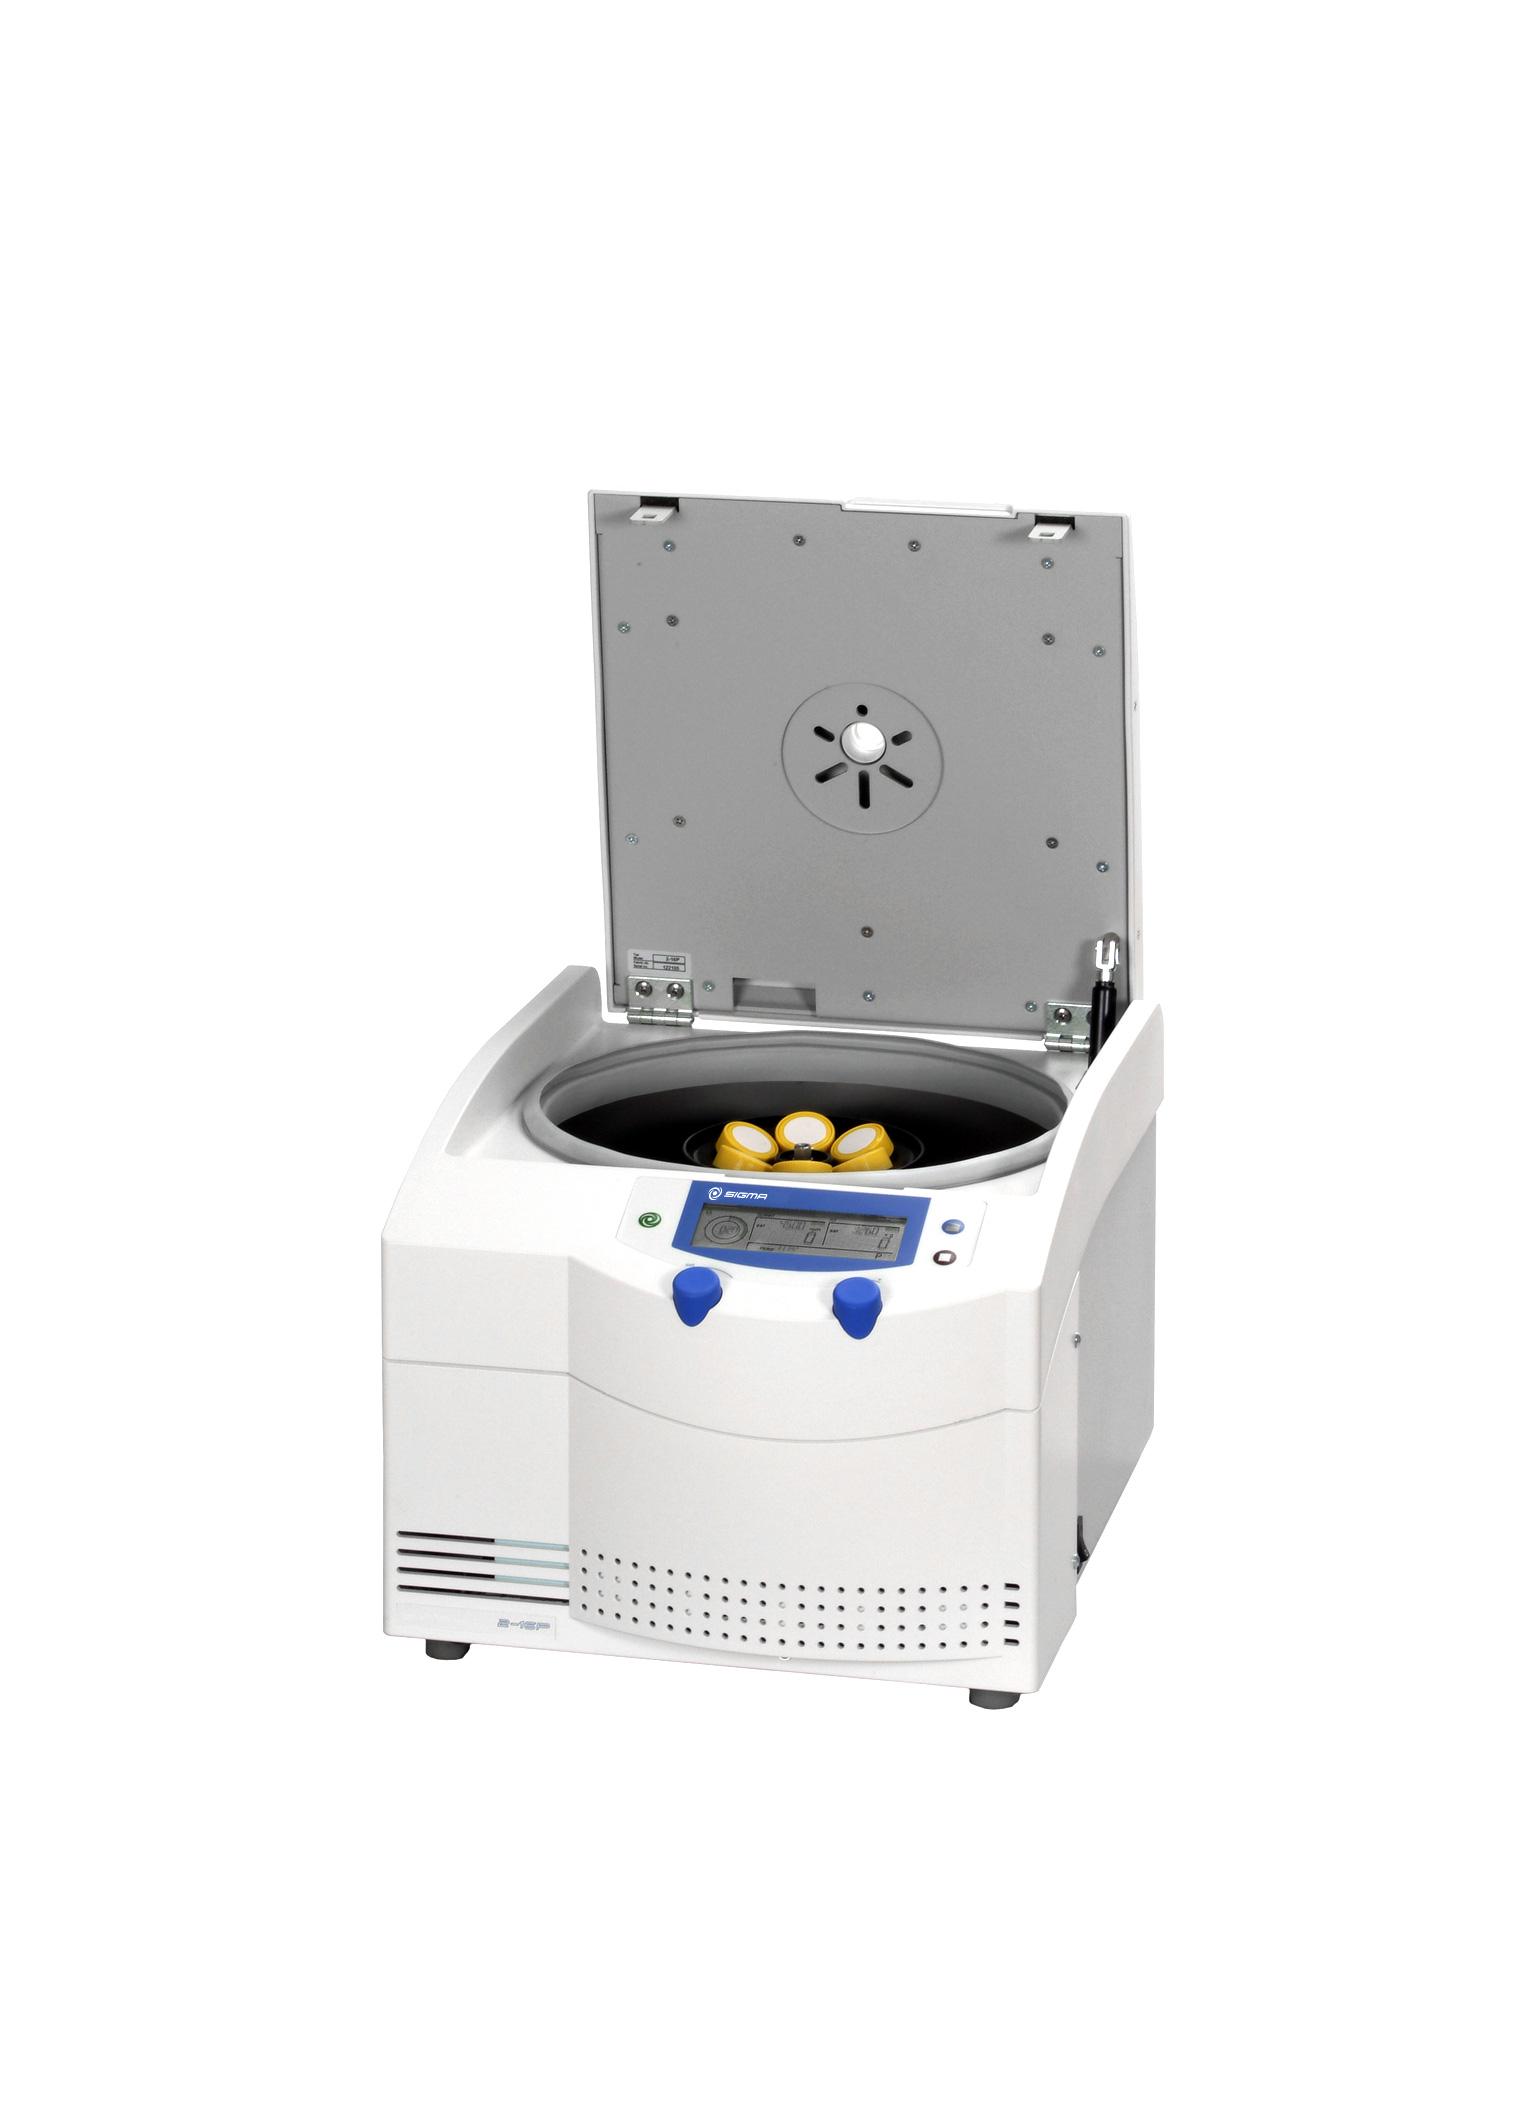 Sigma 2-16P centrifuge open lid